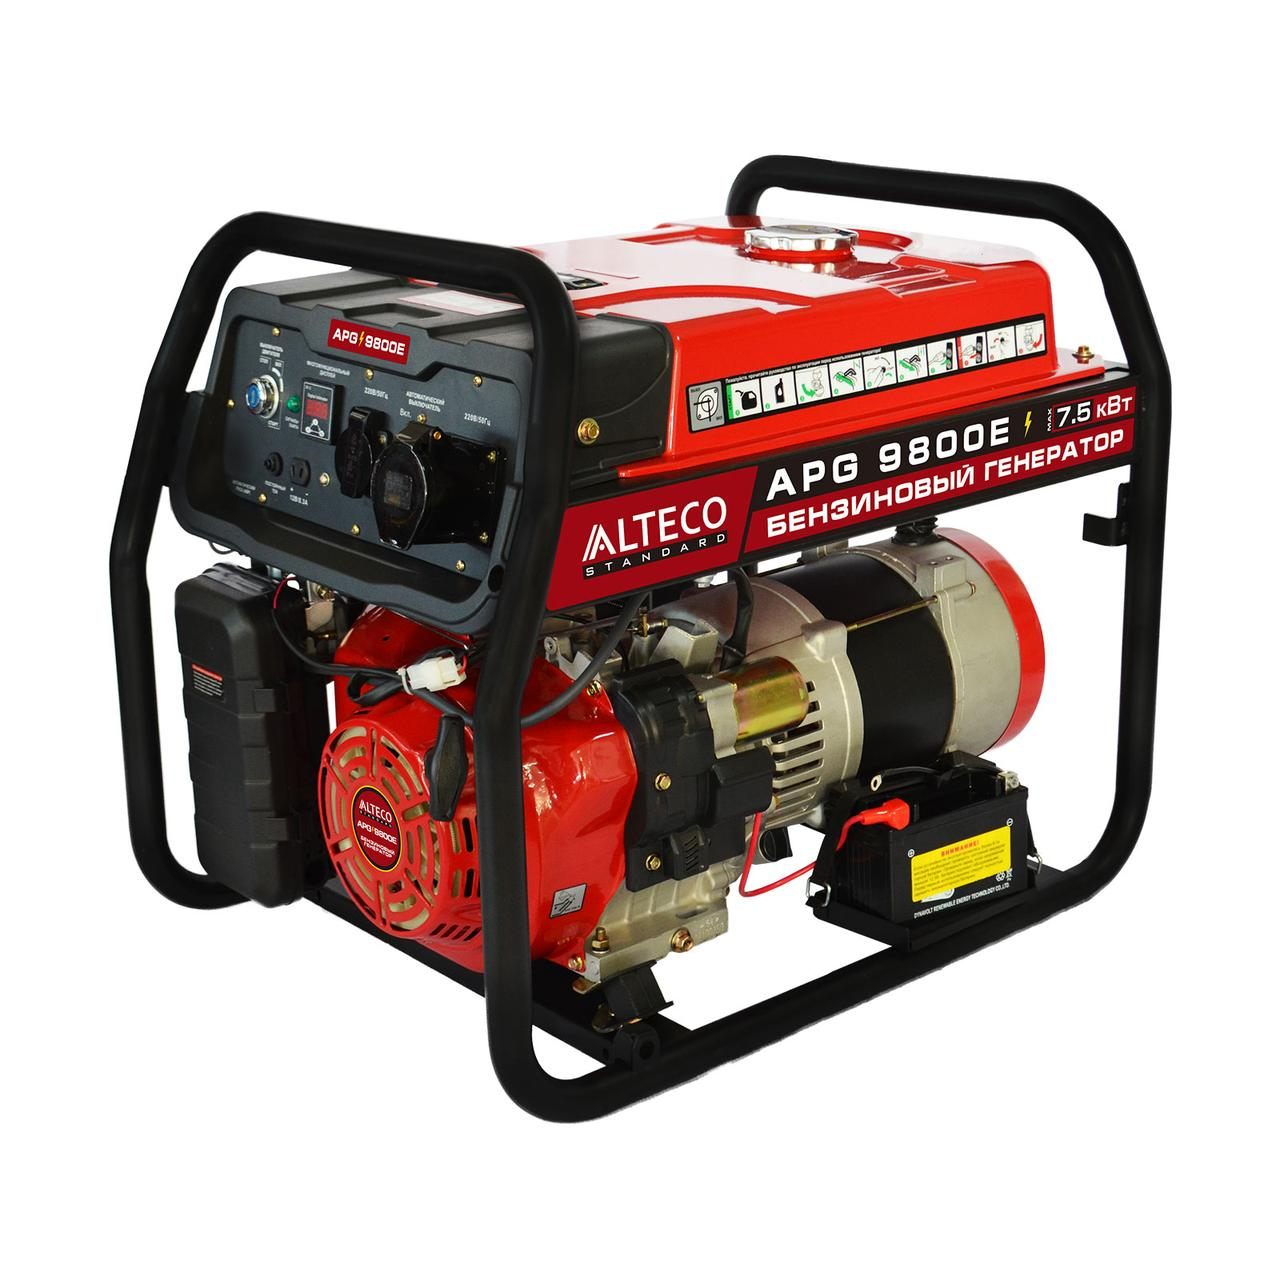 Бензиновый генератор APG 9800E (N) ALTECO Standard